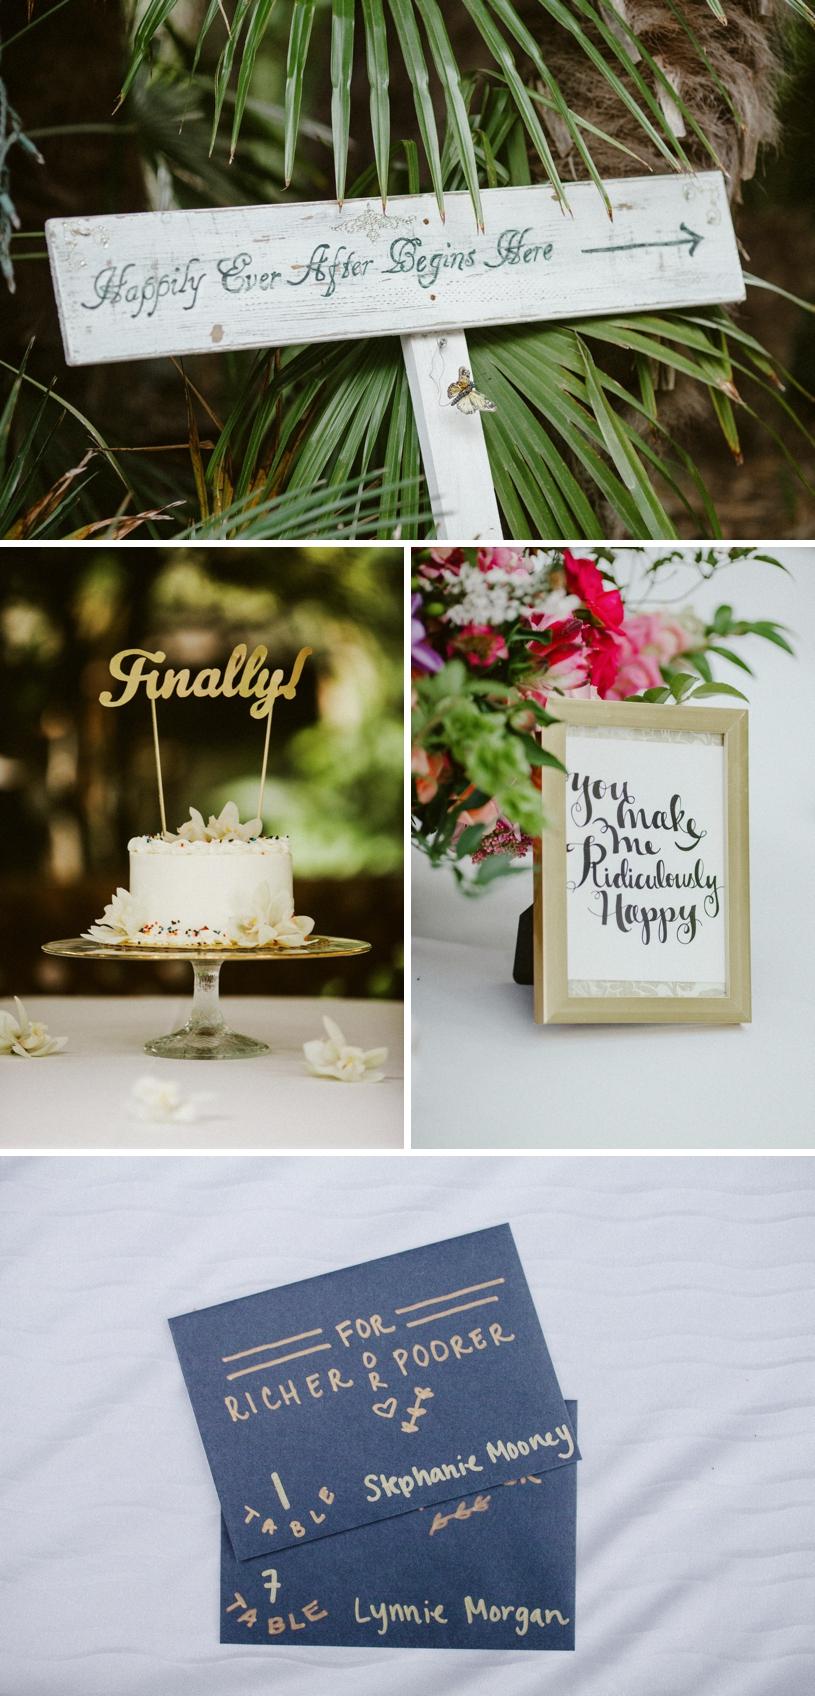 layfayette-park-hotel-wedding17